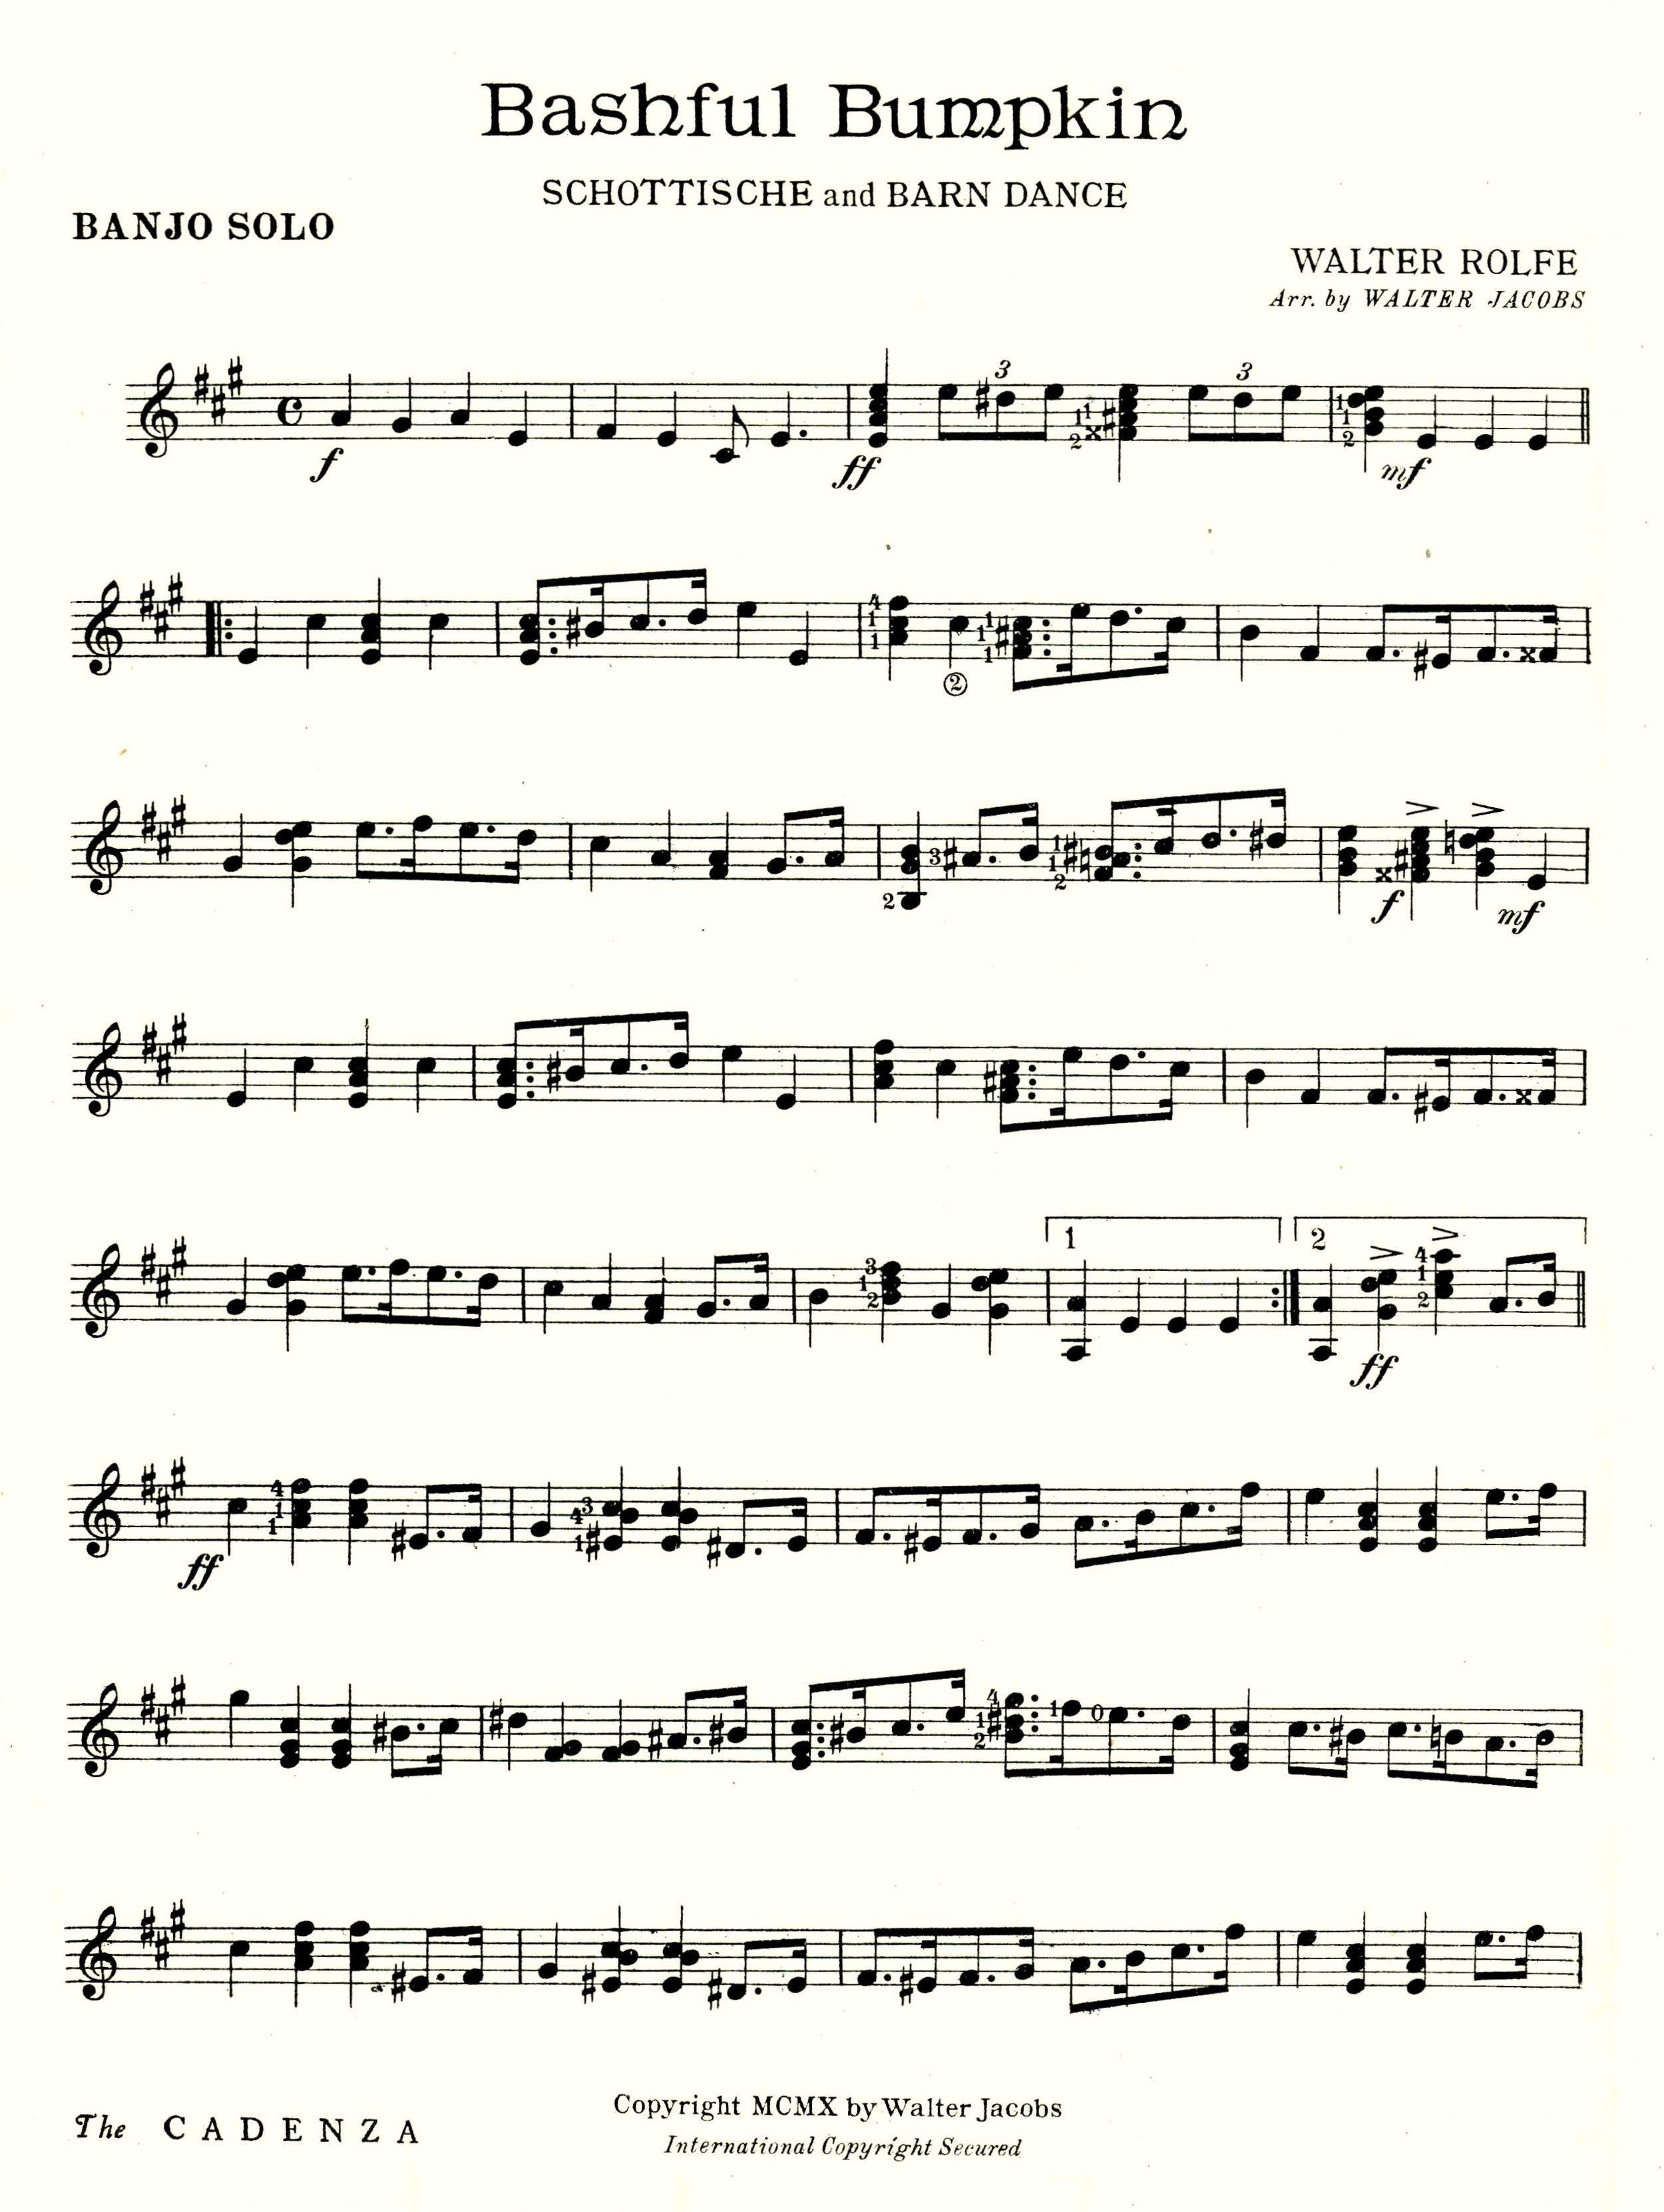 The Cadenza , February 1910, Vol. XVI No. 8